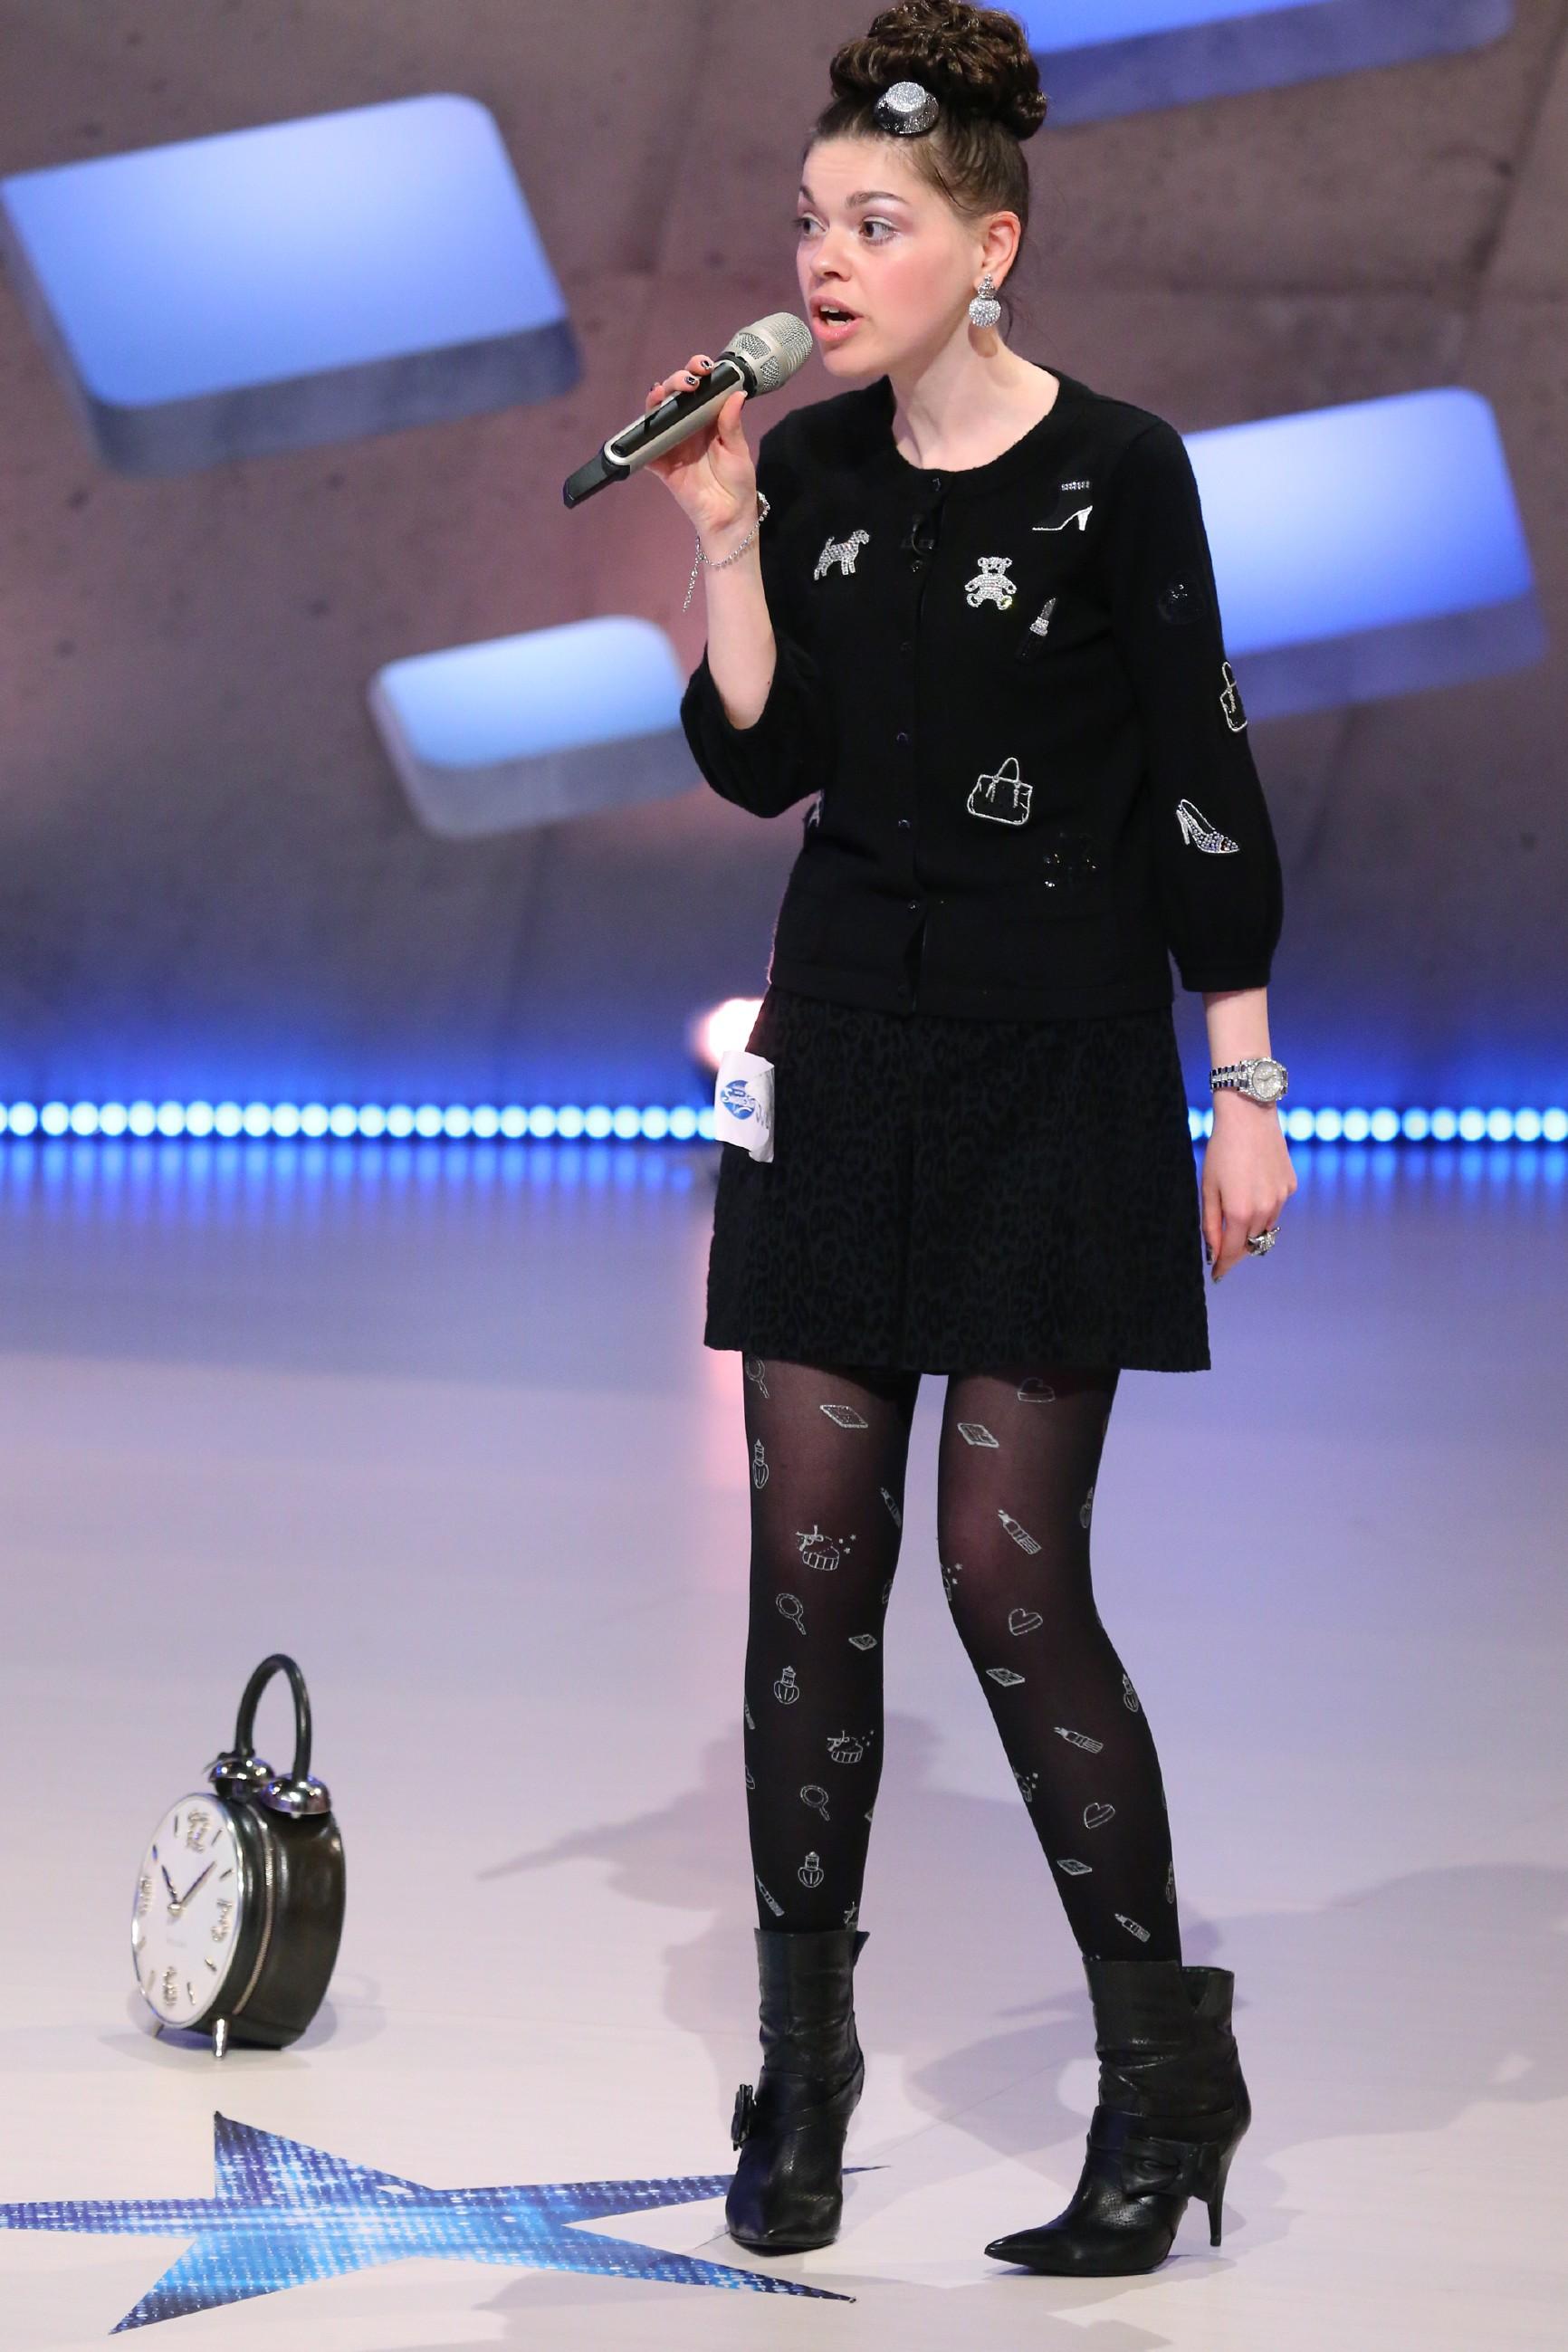 DSDS 2015 Casting 5 - Olga Holz aus Konstanz